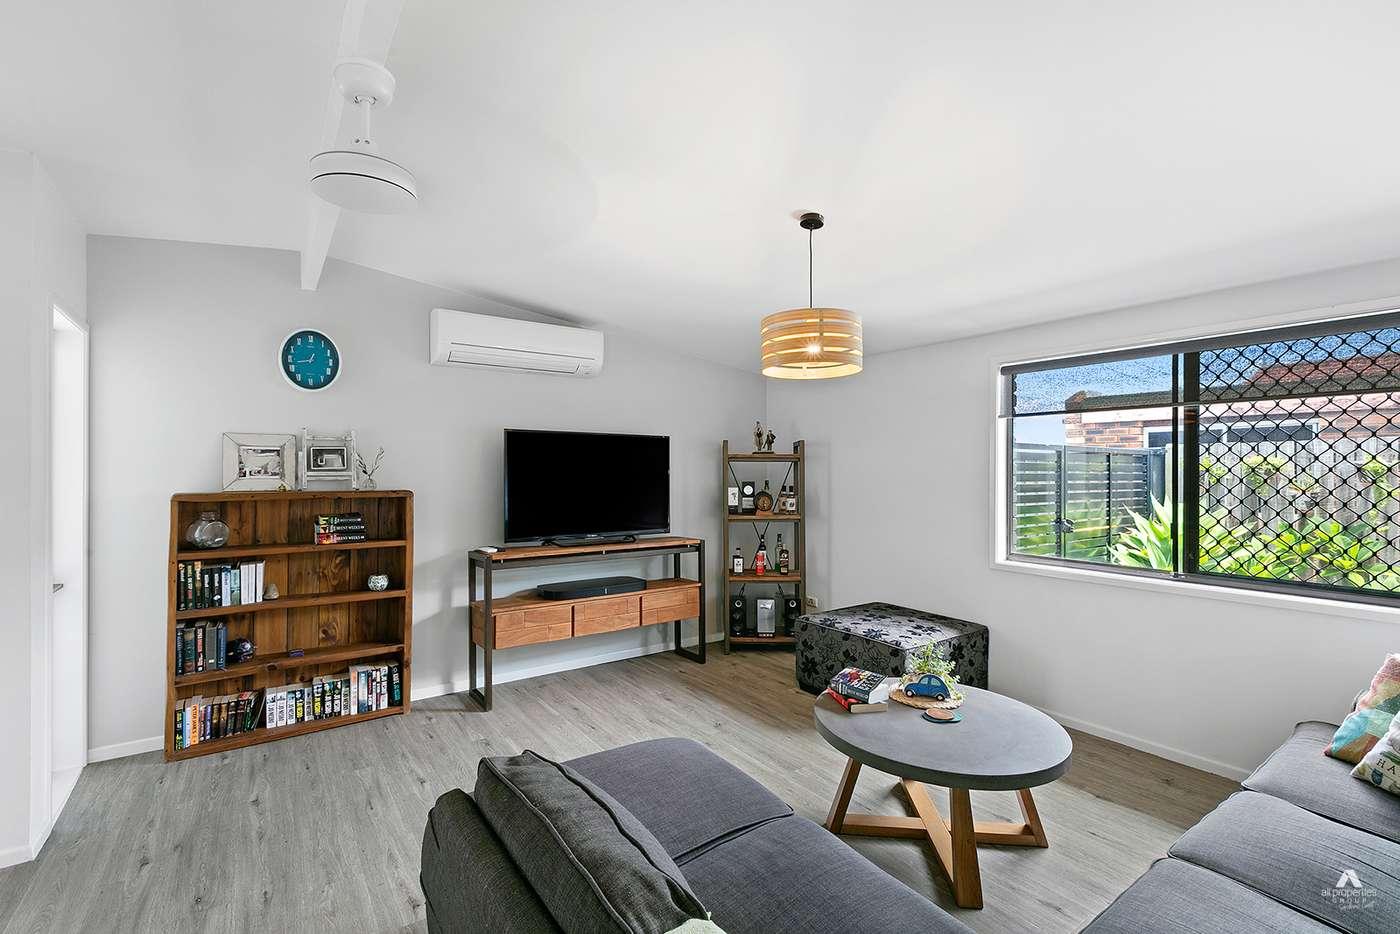 Sixth view of Homely house listing, 34 Parari Street, Warana QLD 4575